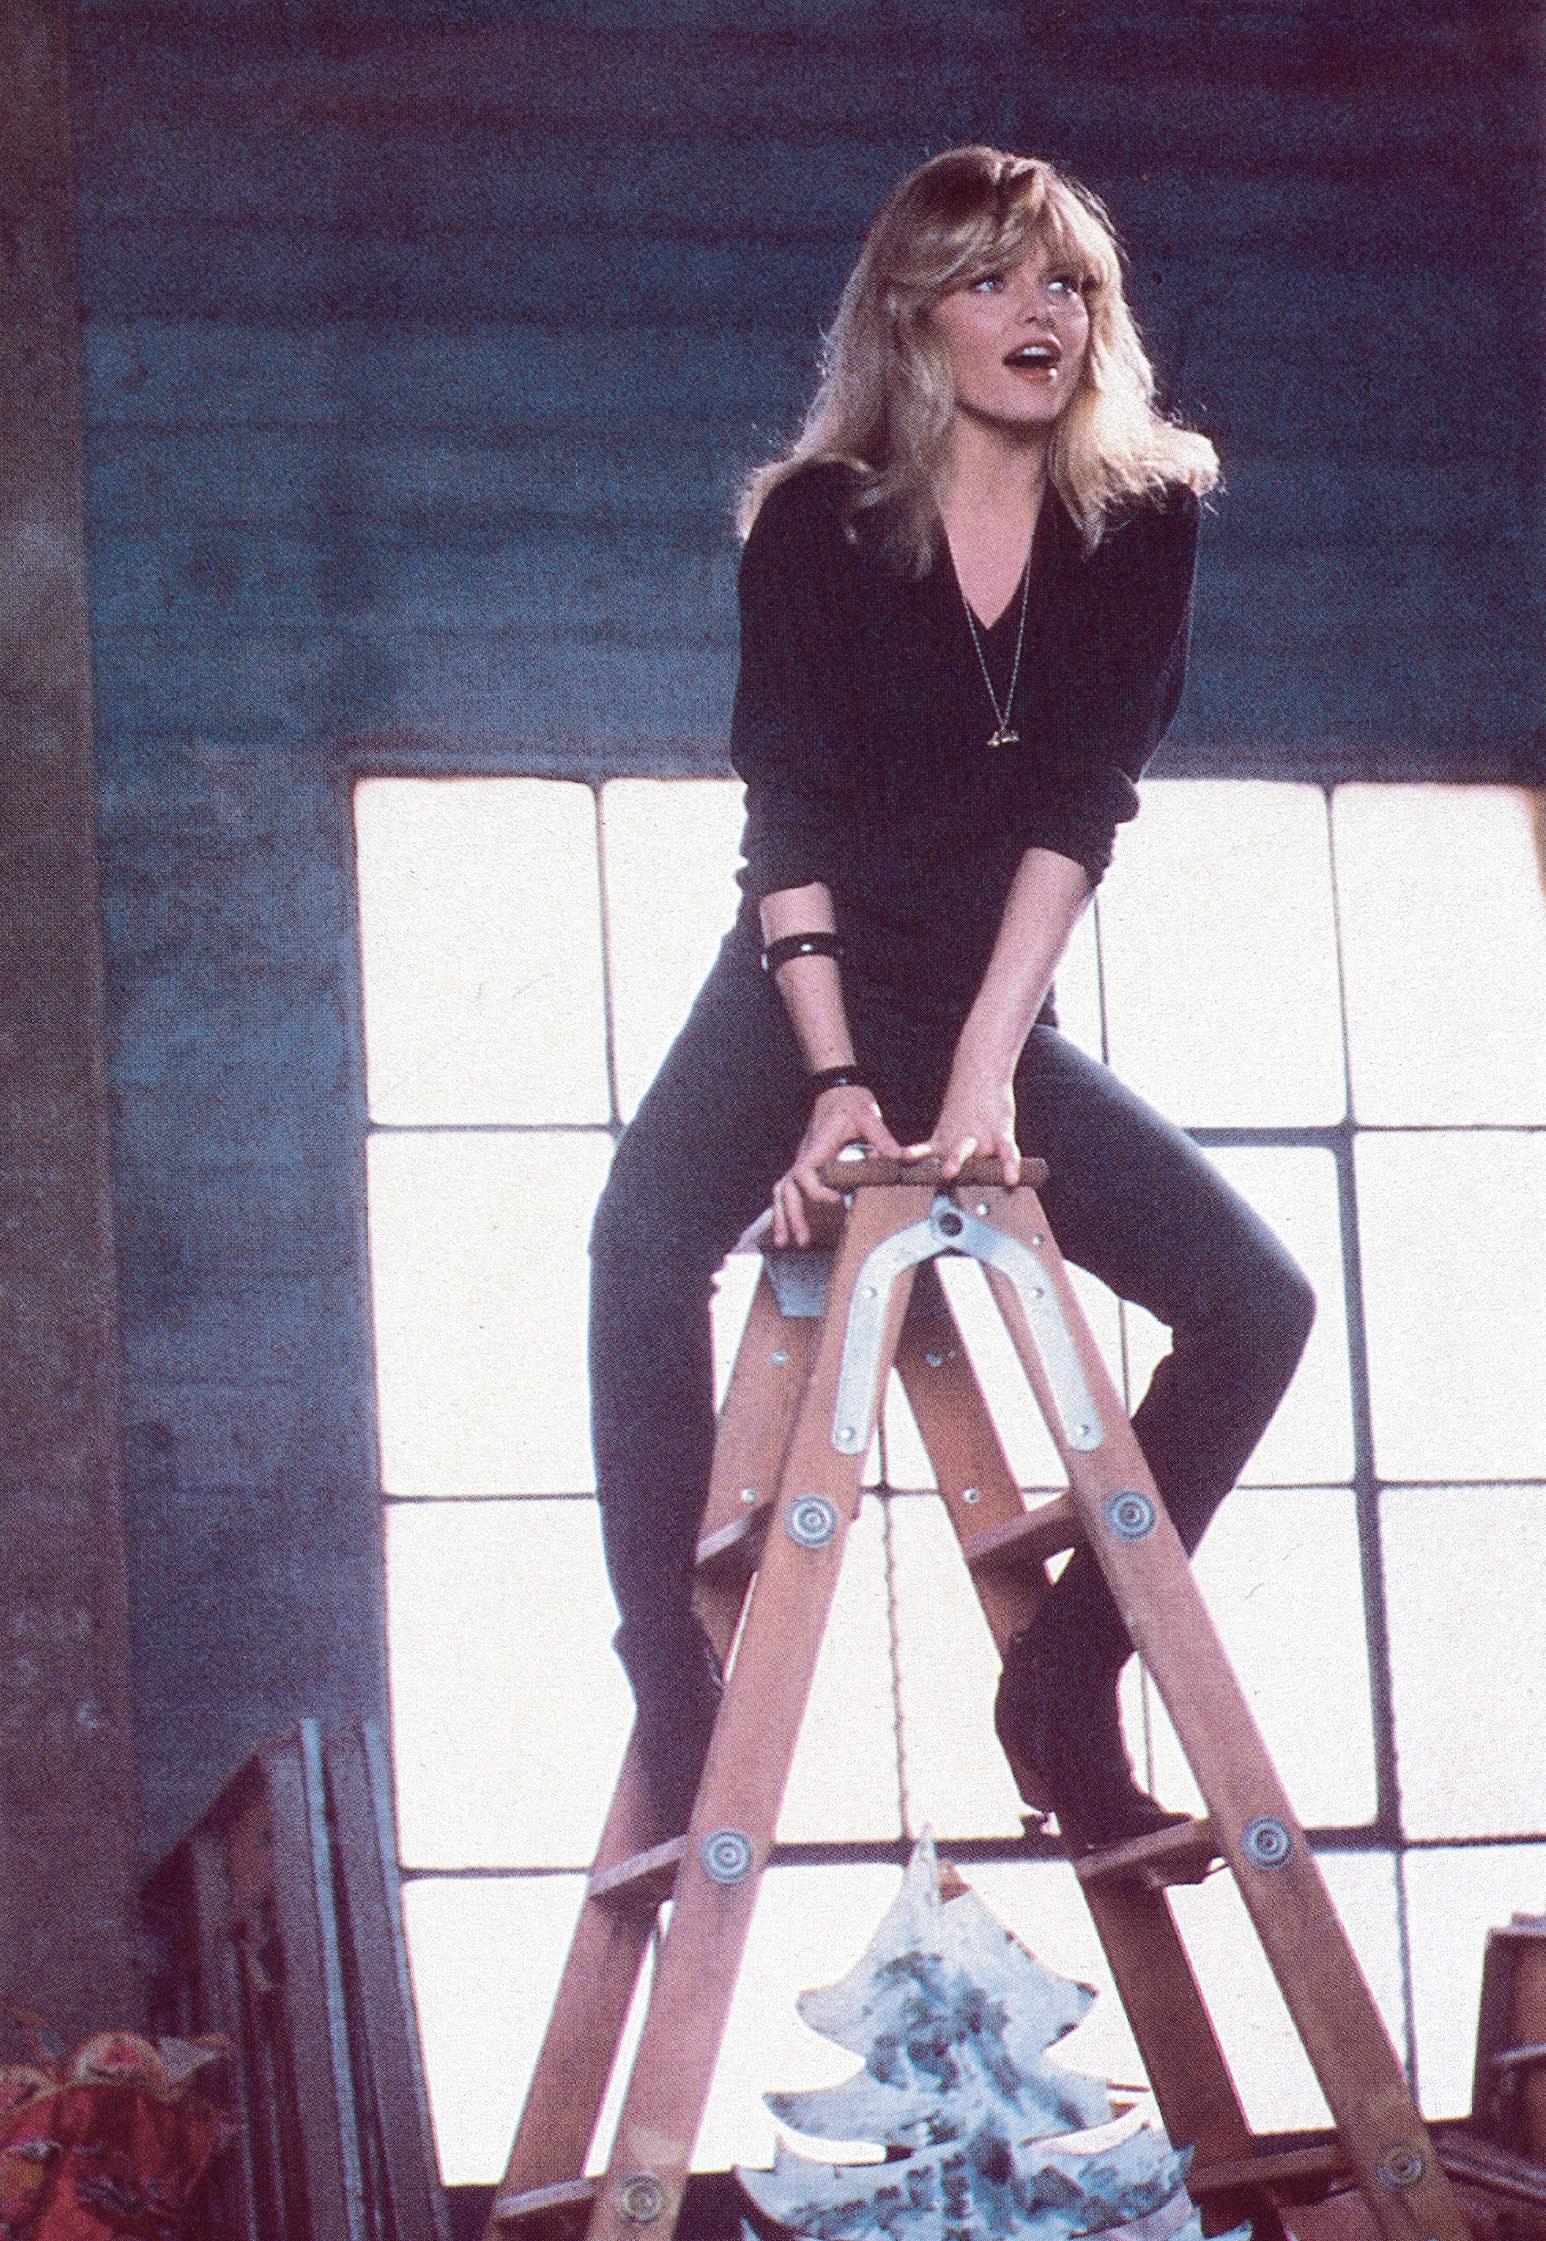 GREASE 2, Michelle Pfeiffer, 1982